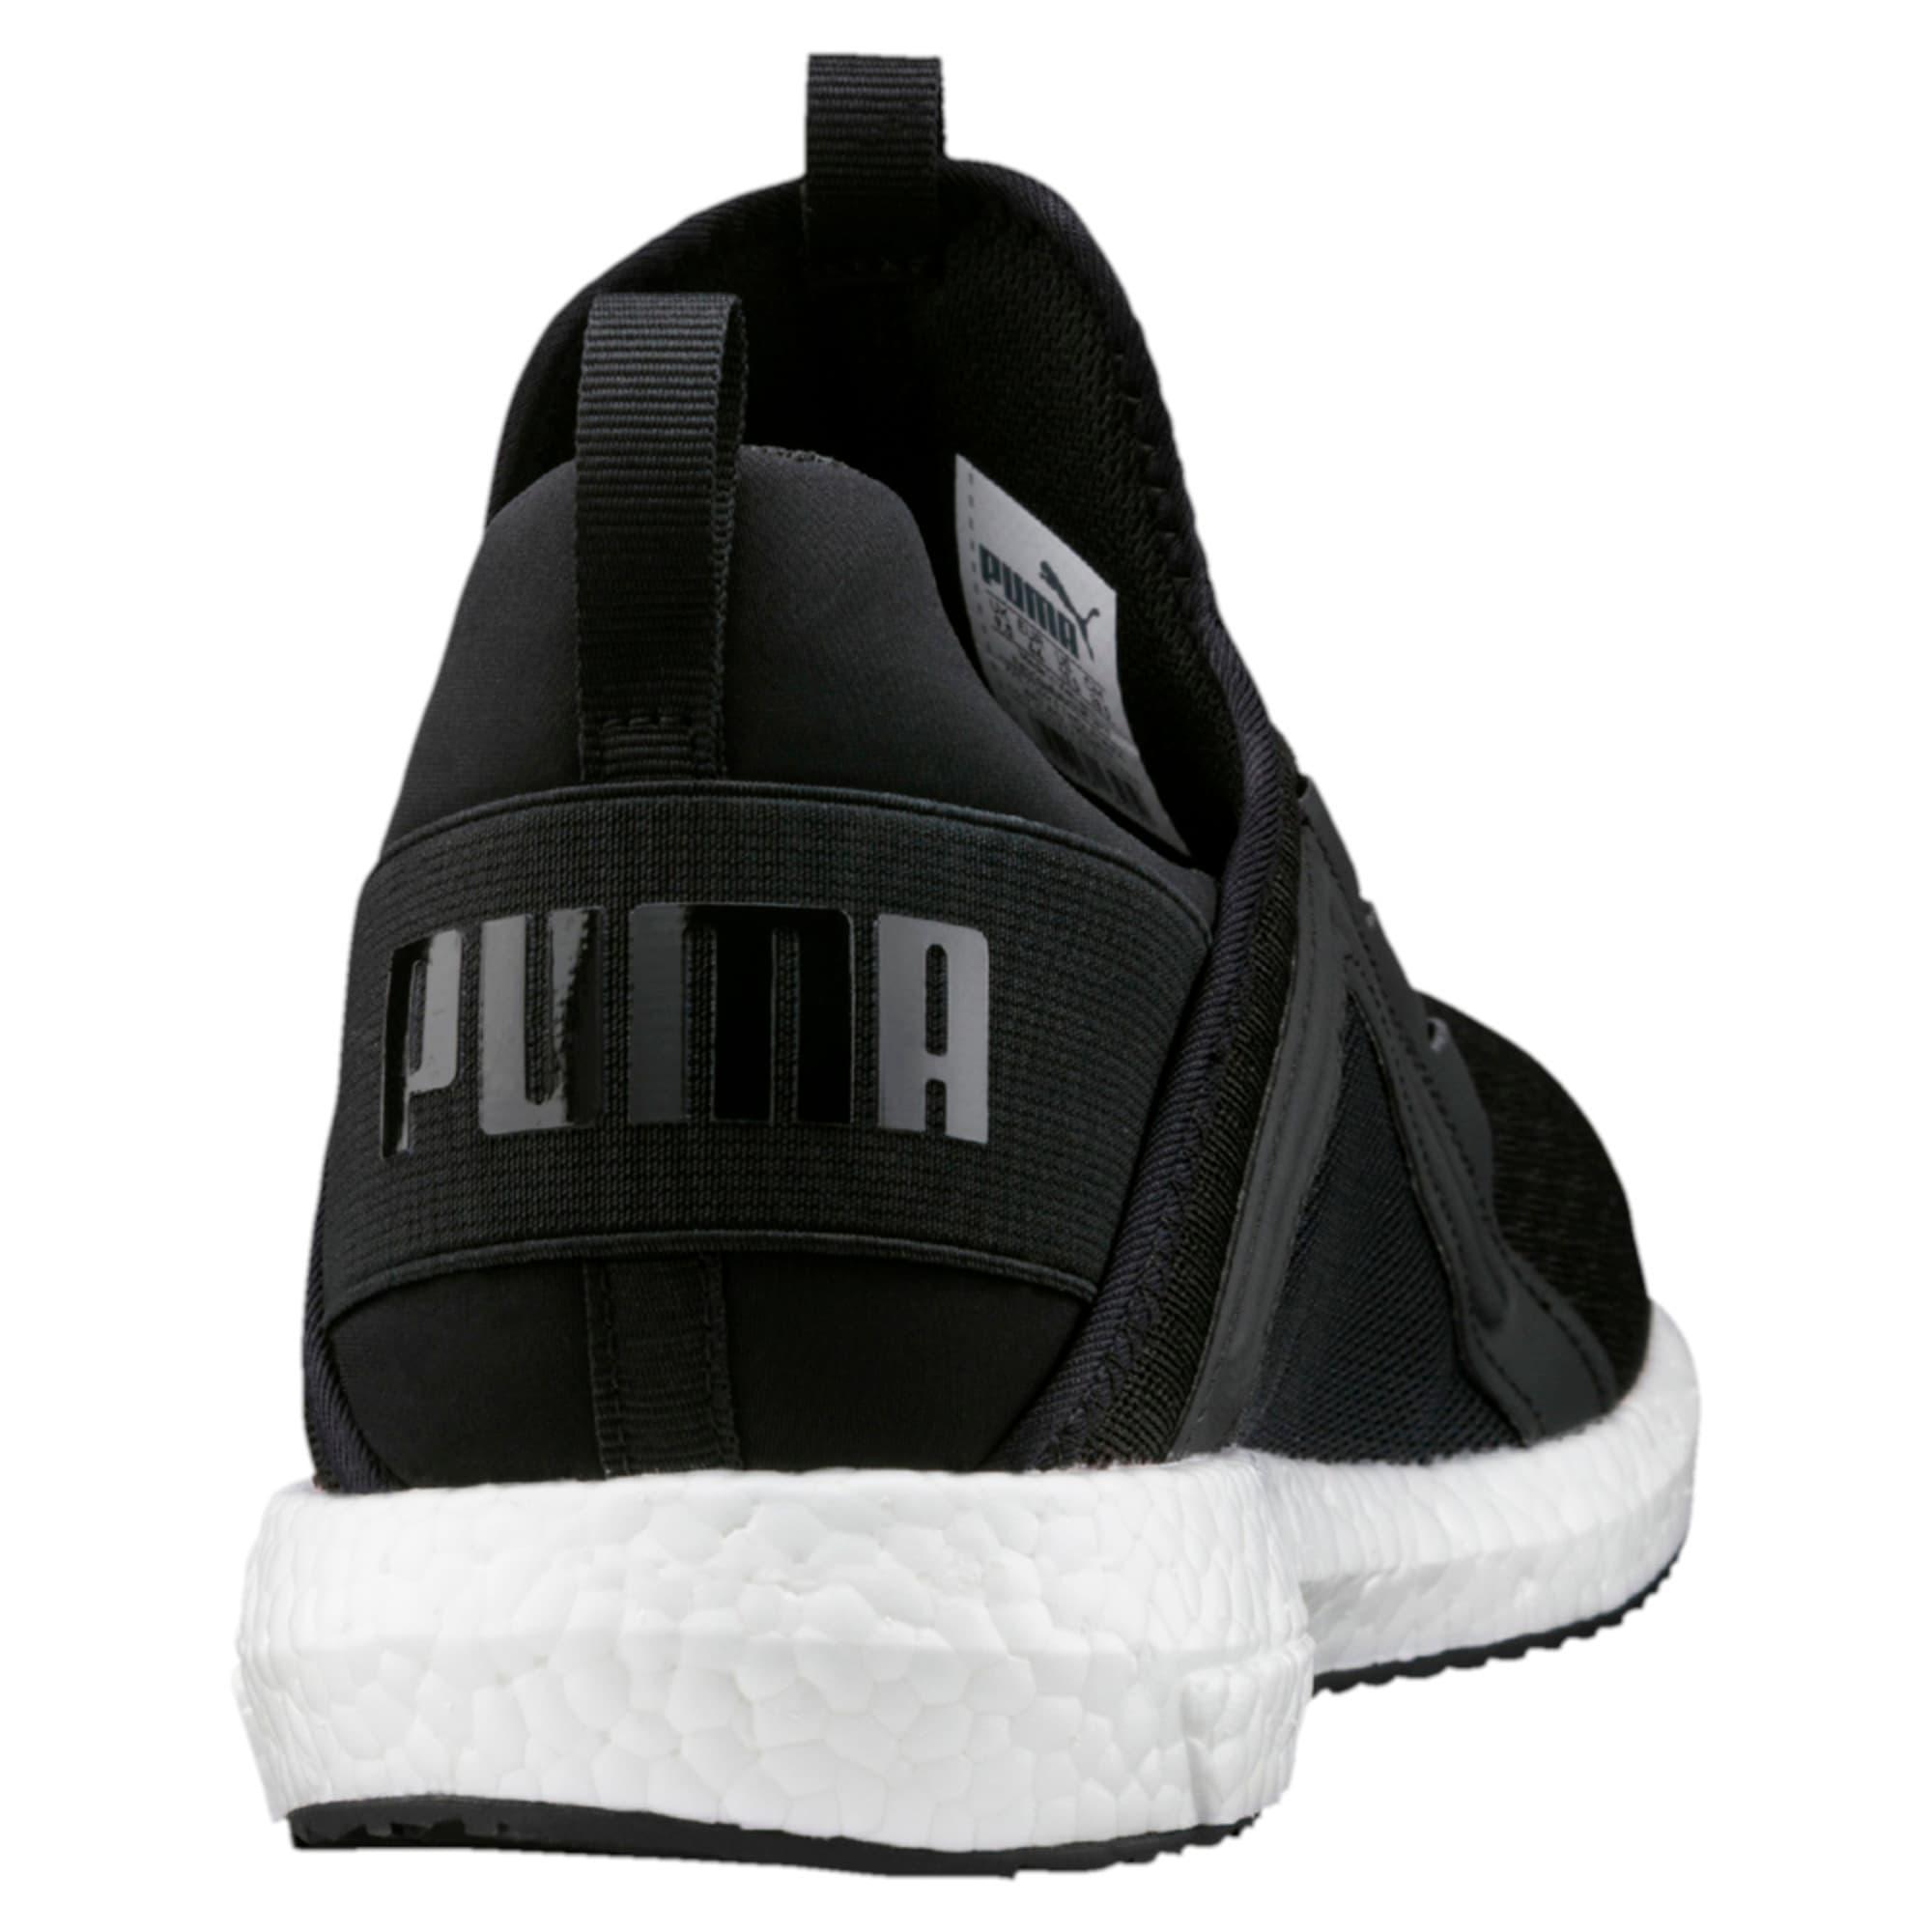 Thumbnail 4 of Mega NRGY Men's Trainers, Puma Black-Puma Black, medium-IND